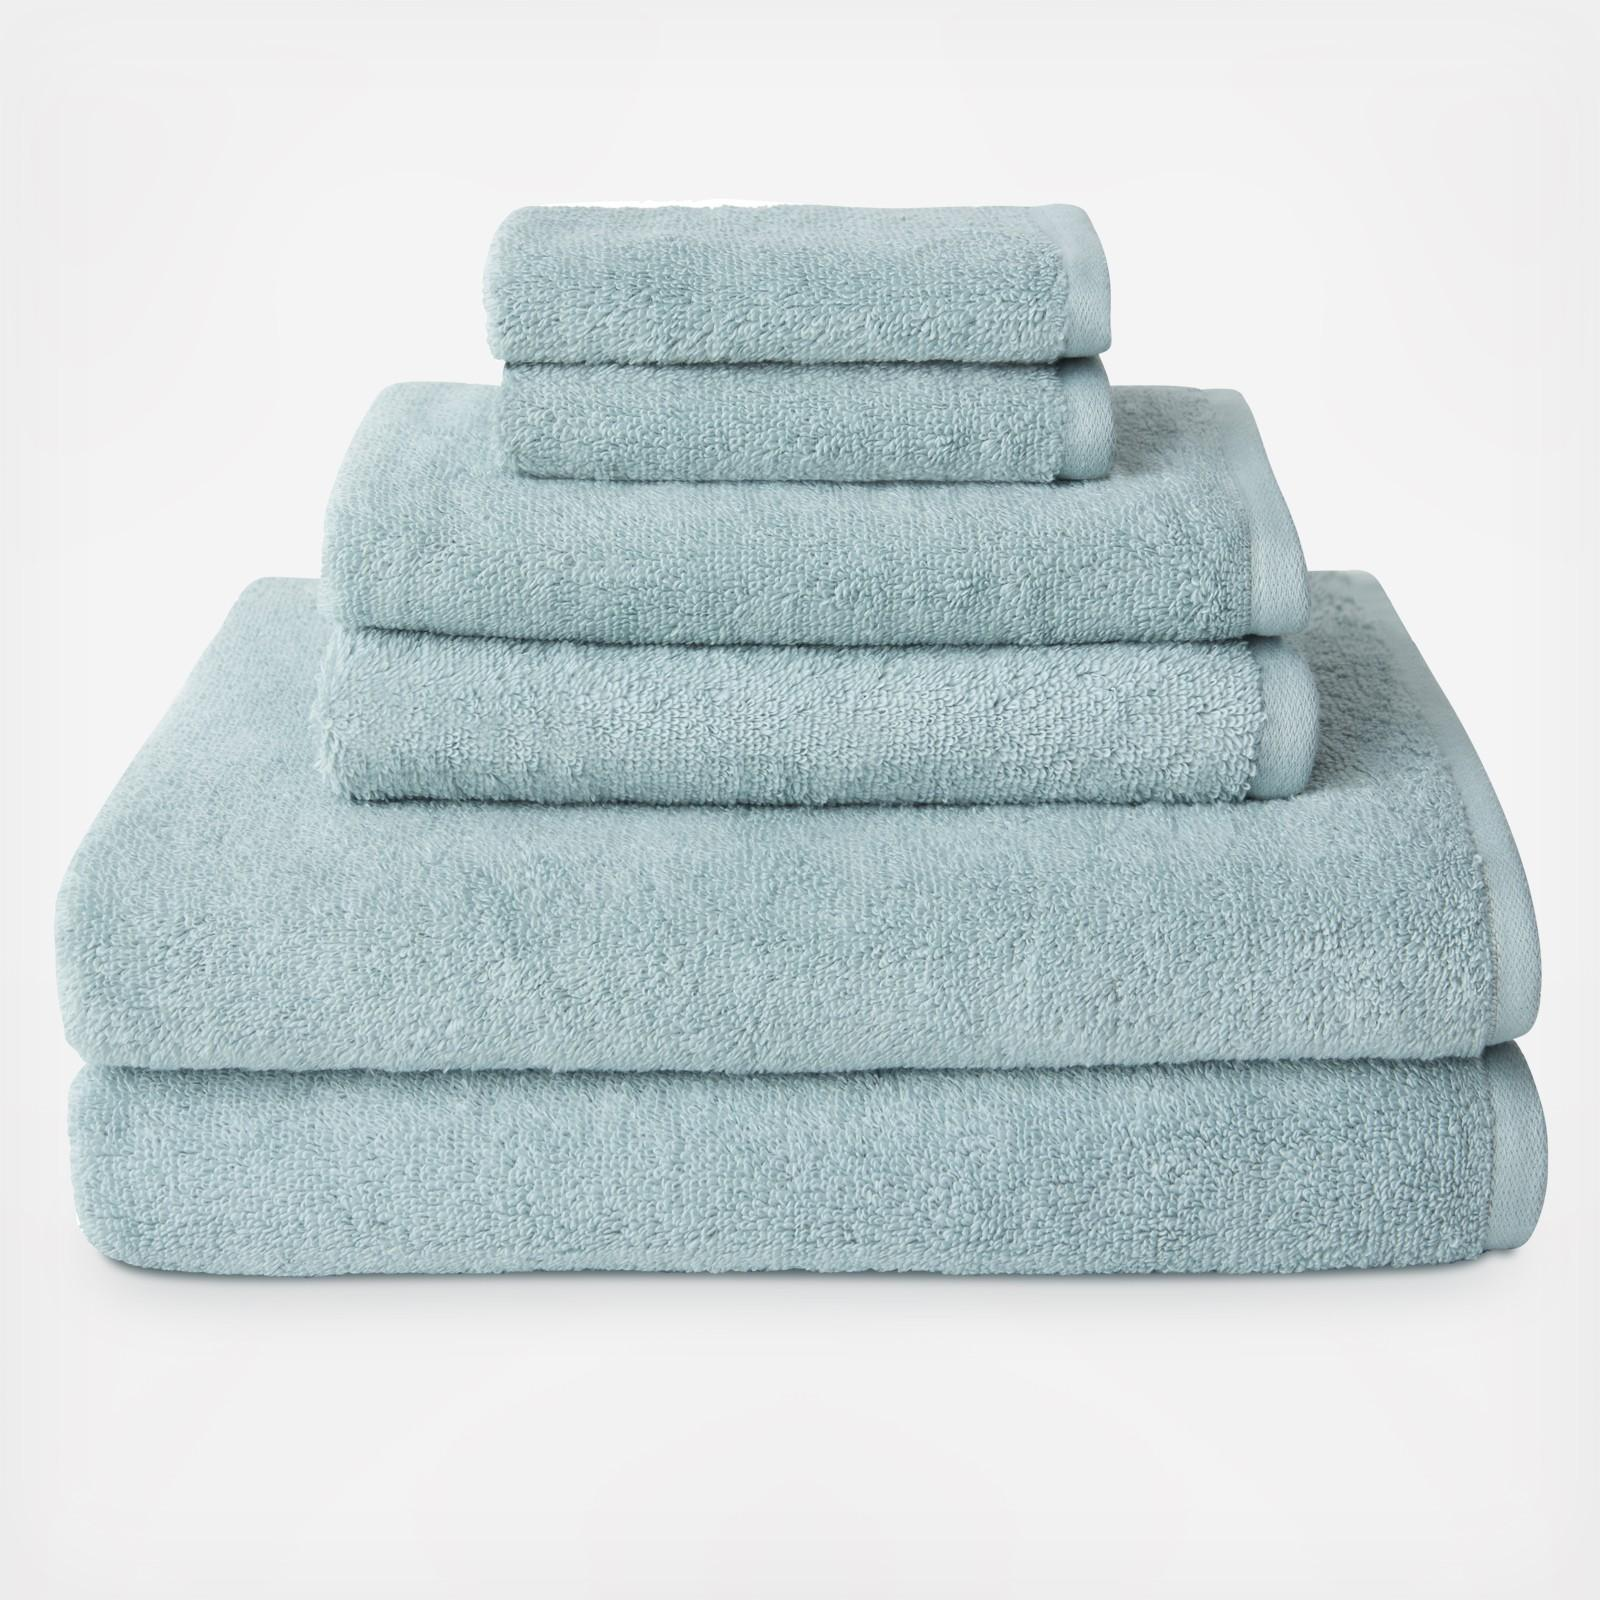 Amaze by welspun cotton sheet set bedding king navy blue - Amaze By Welspun Cotton Sheet Set Bedding King Navy Blue 36